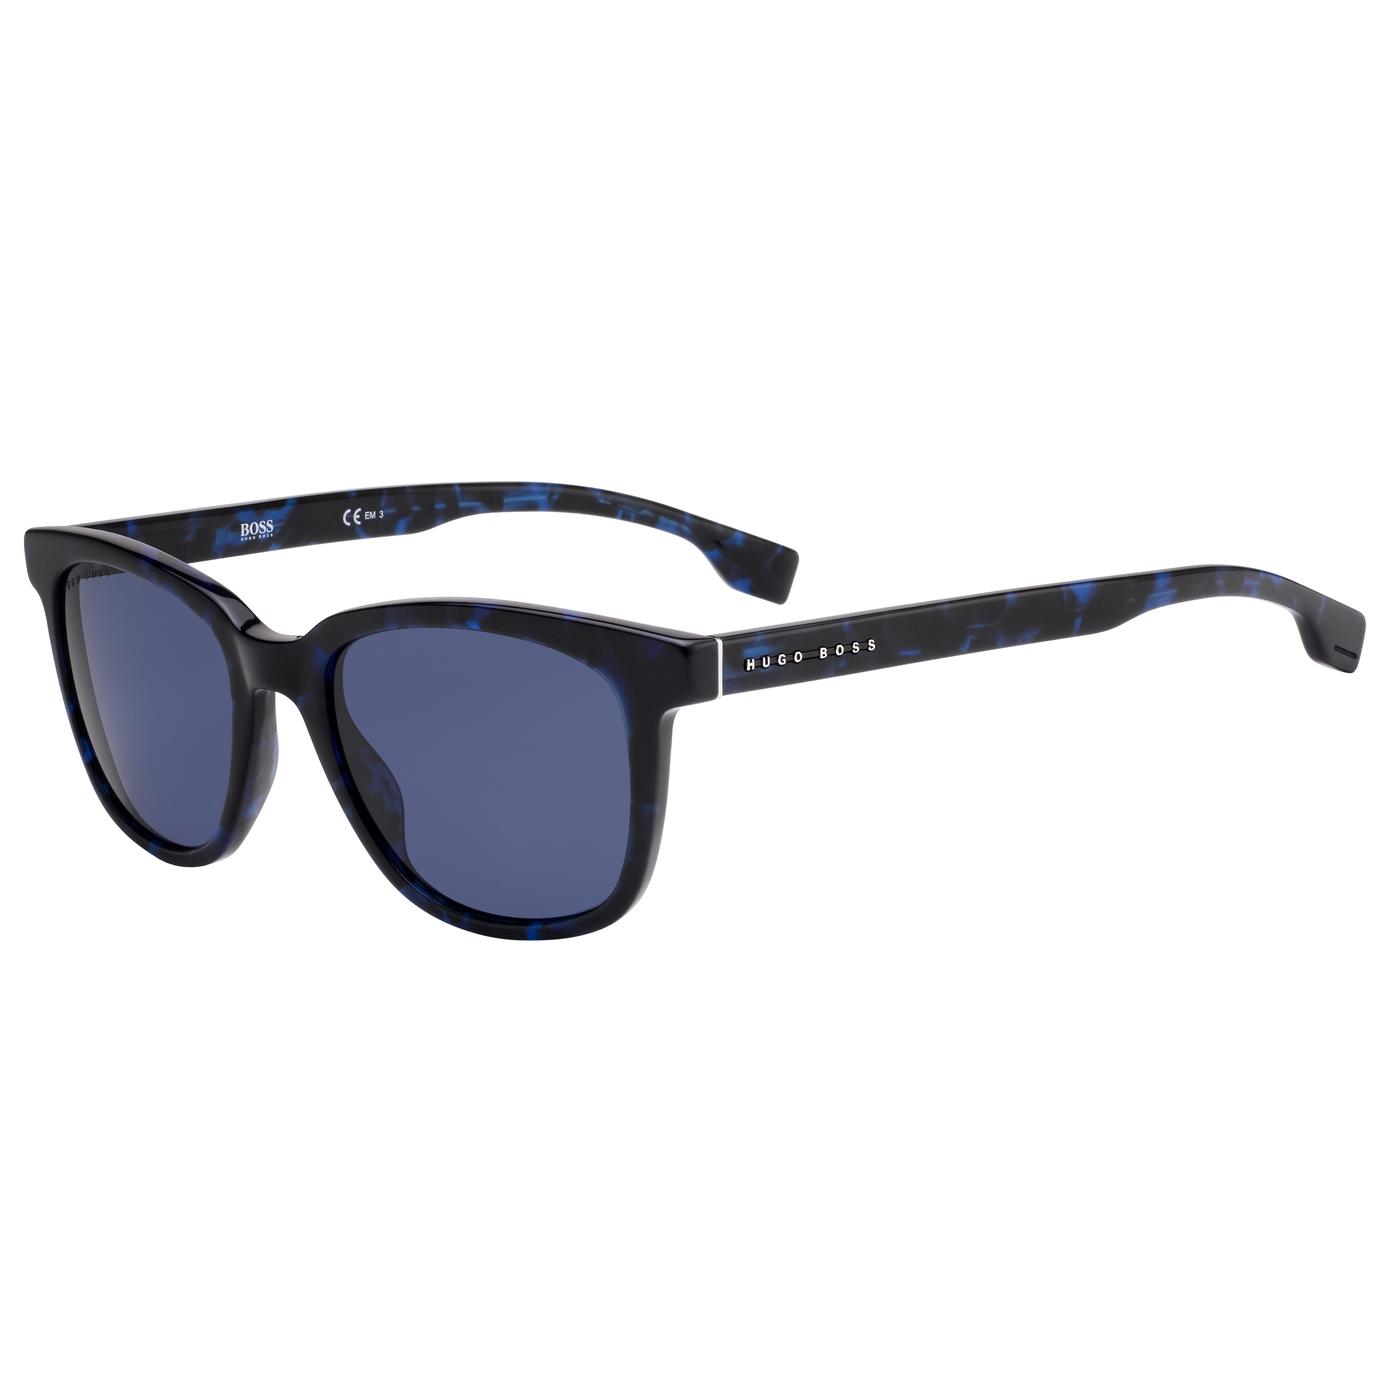 Bilde av Boss Blue Havana Sunglasses BOSS 1037S JBW 51 KU